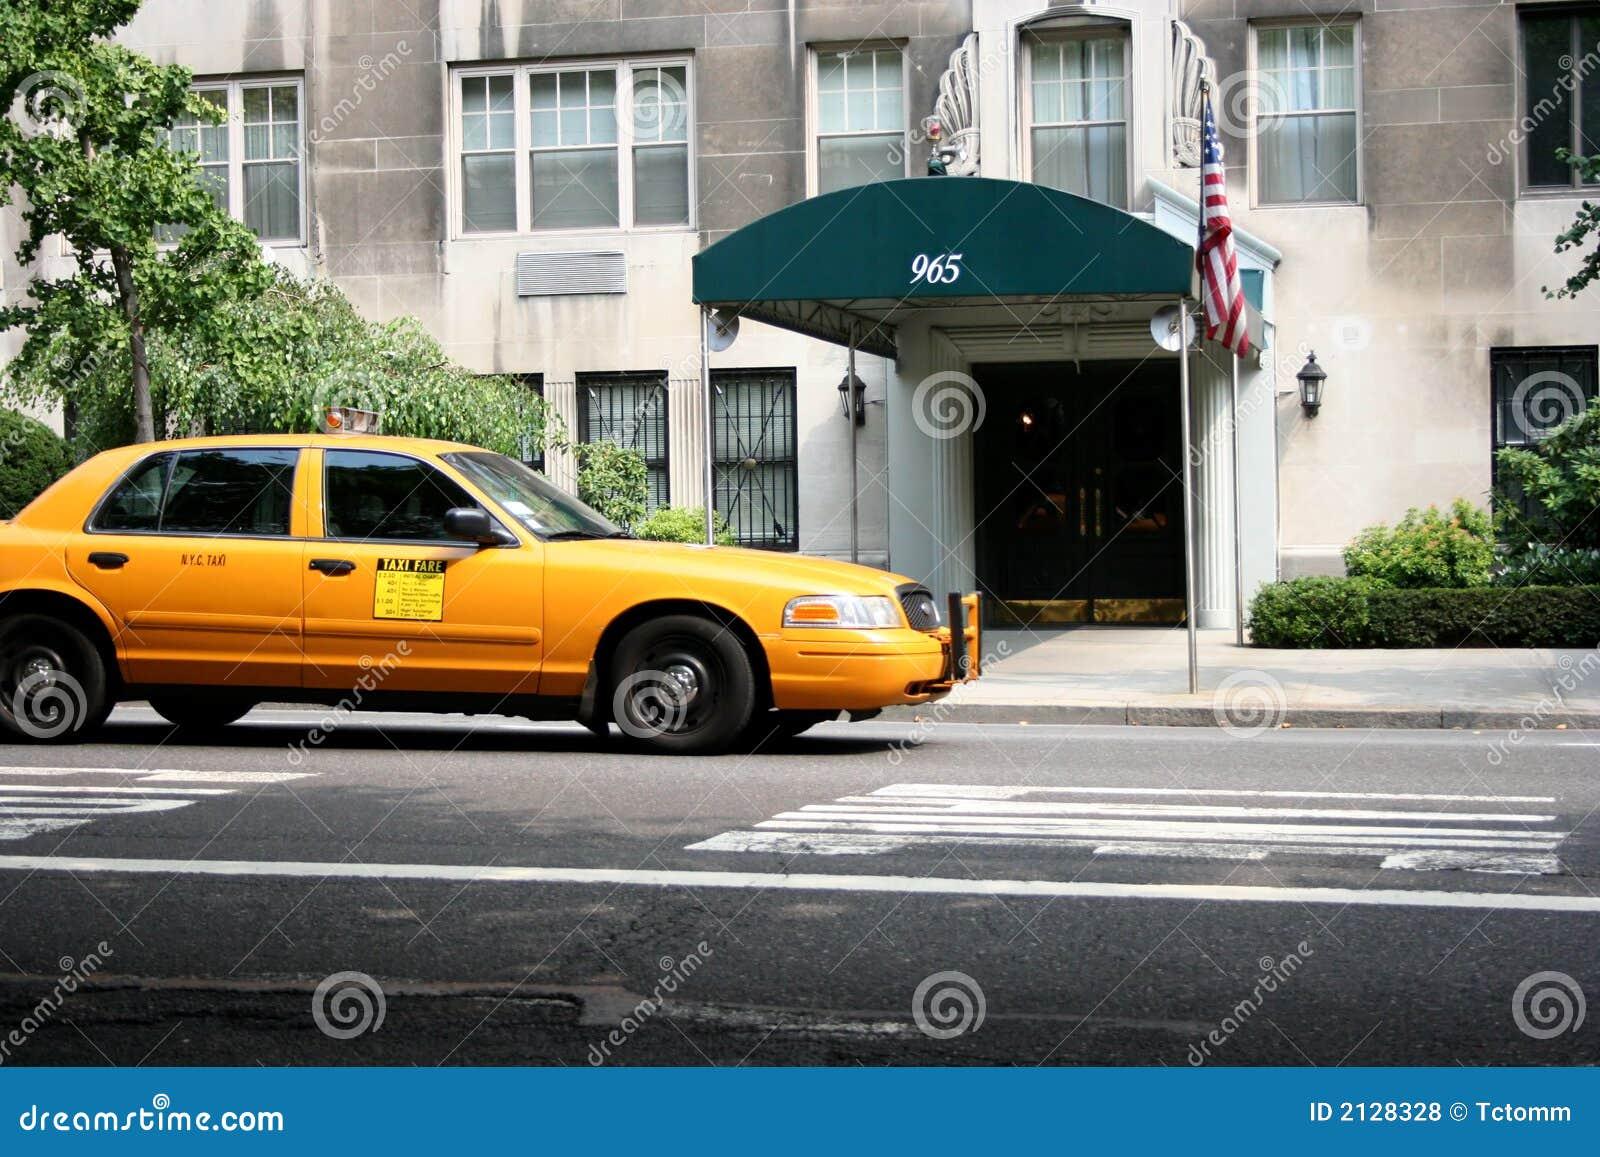 Taxi Cab Food Truck